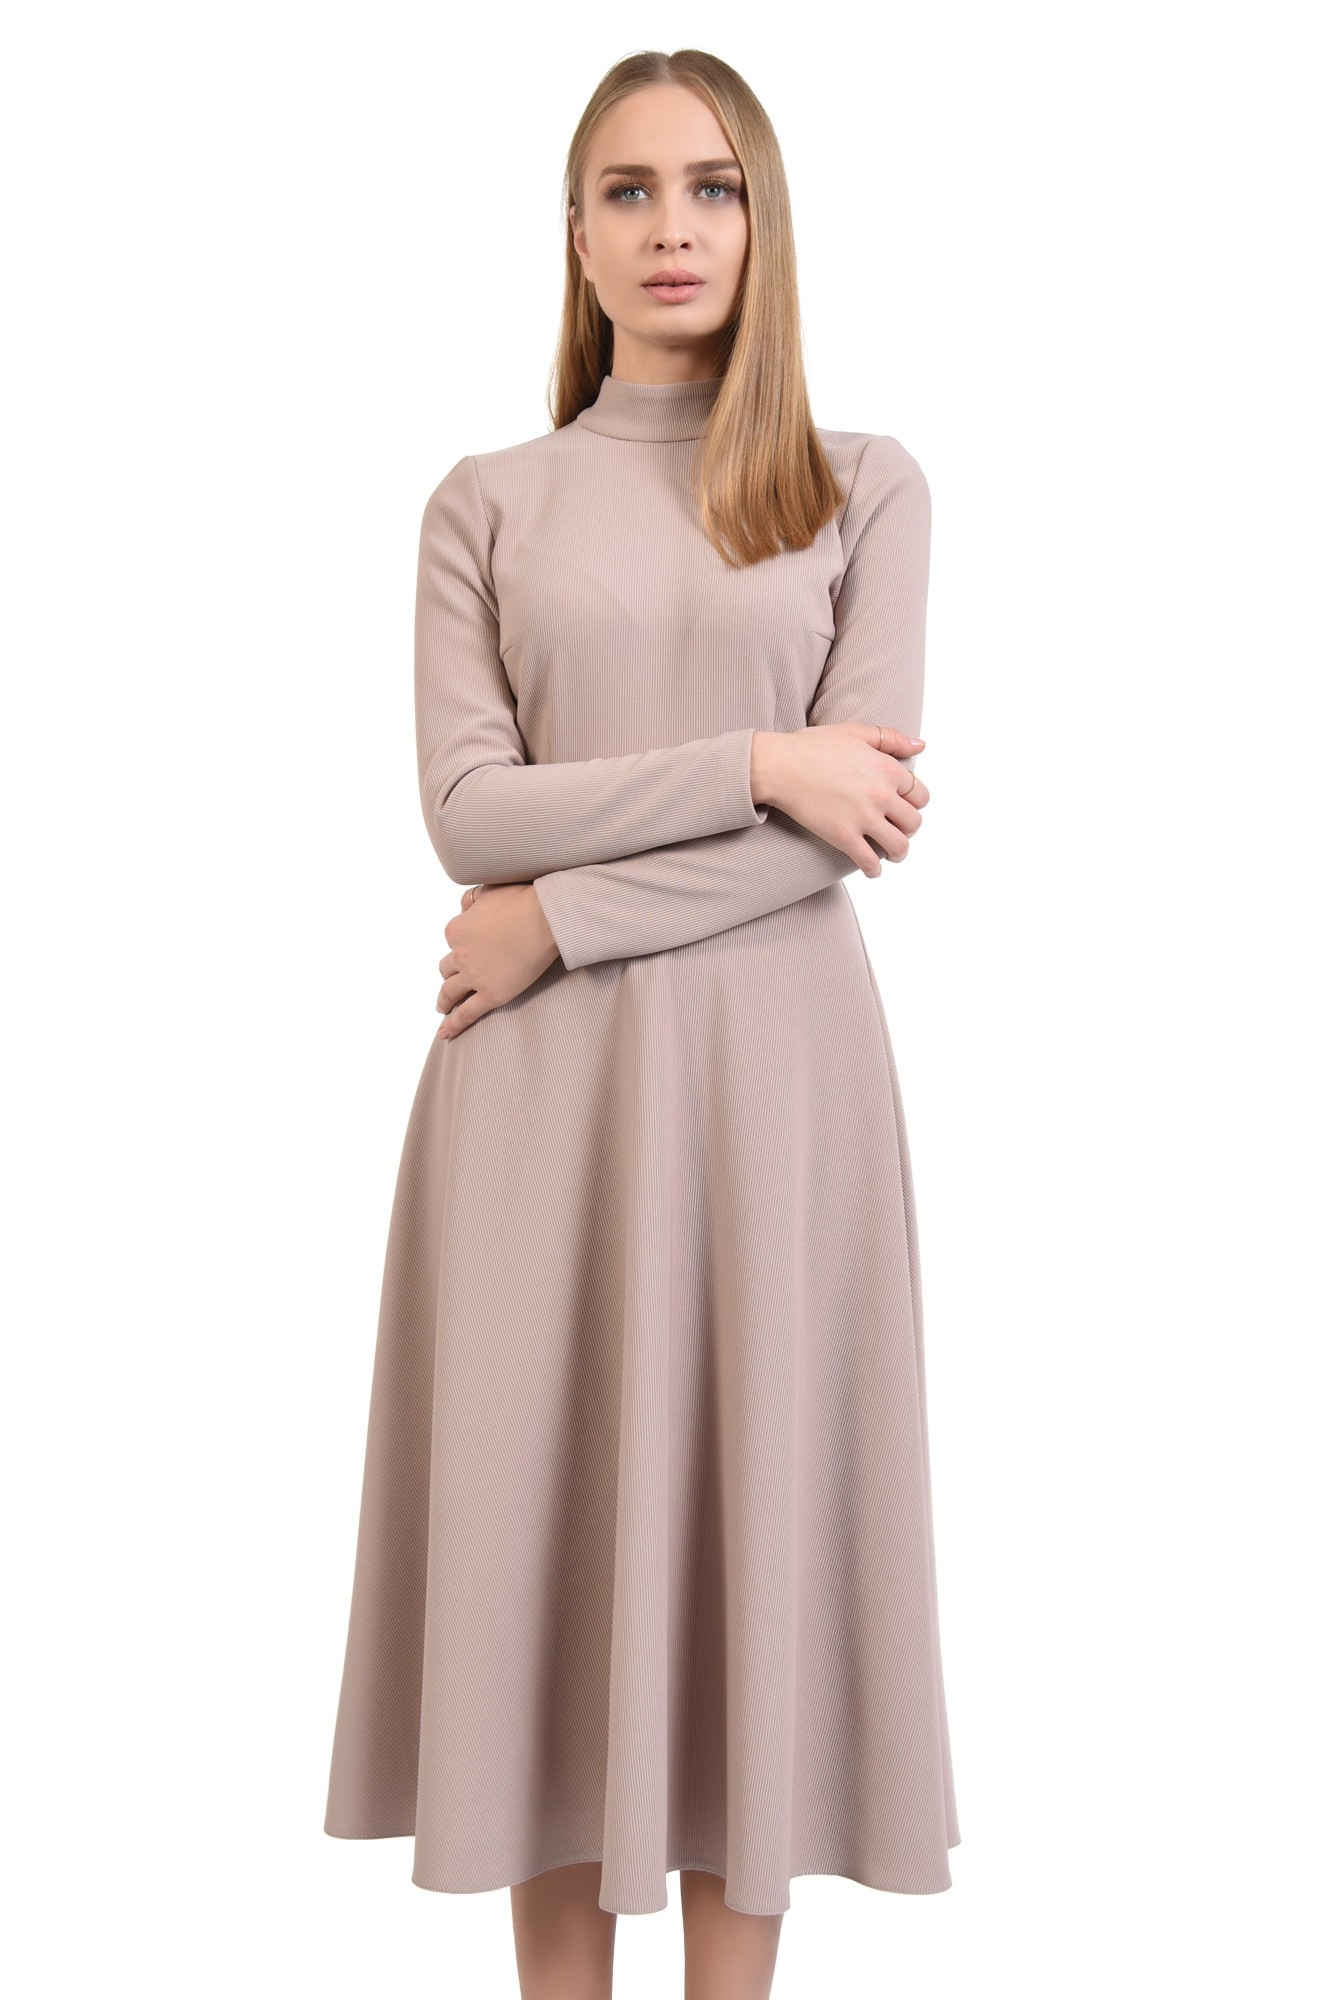 0 - rochie evazata, cu guler inalt, nasturi perla la spate, roz